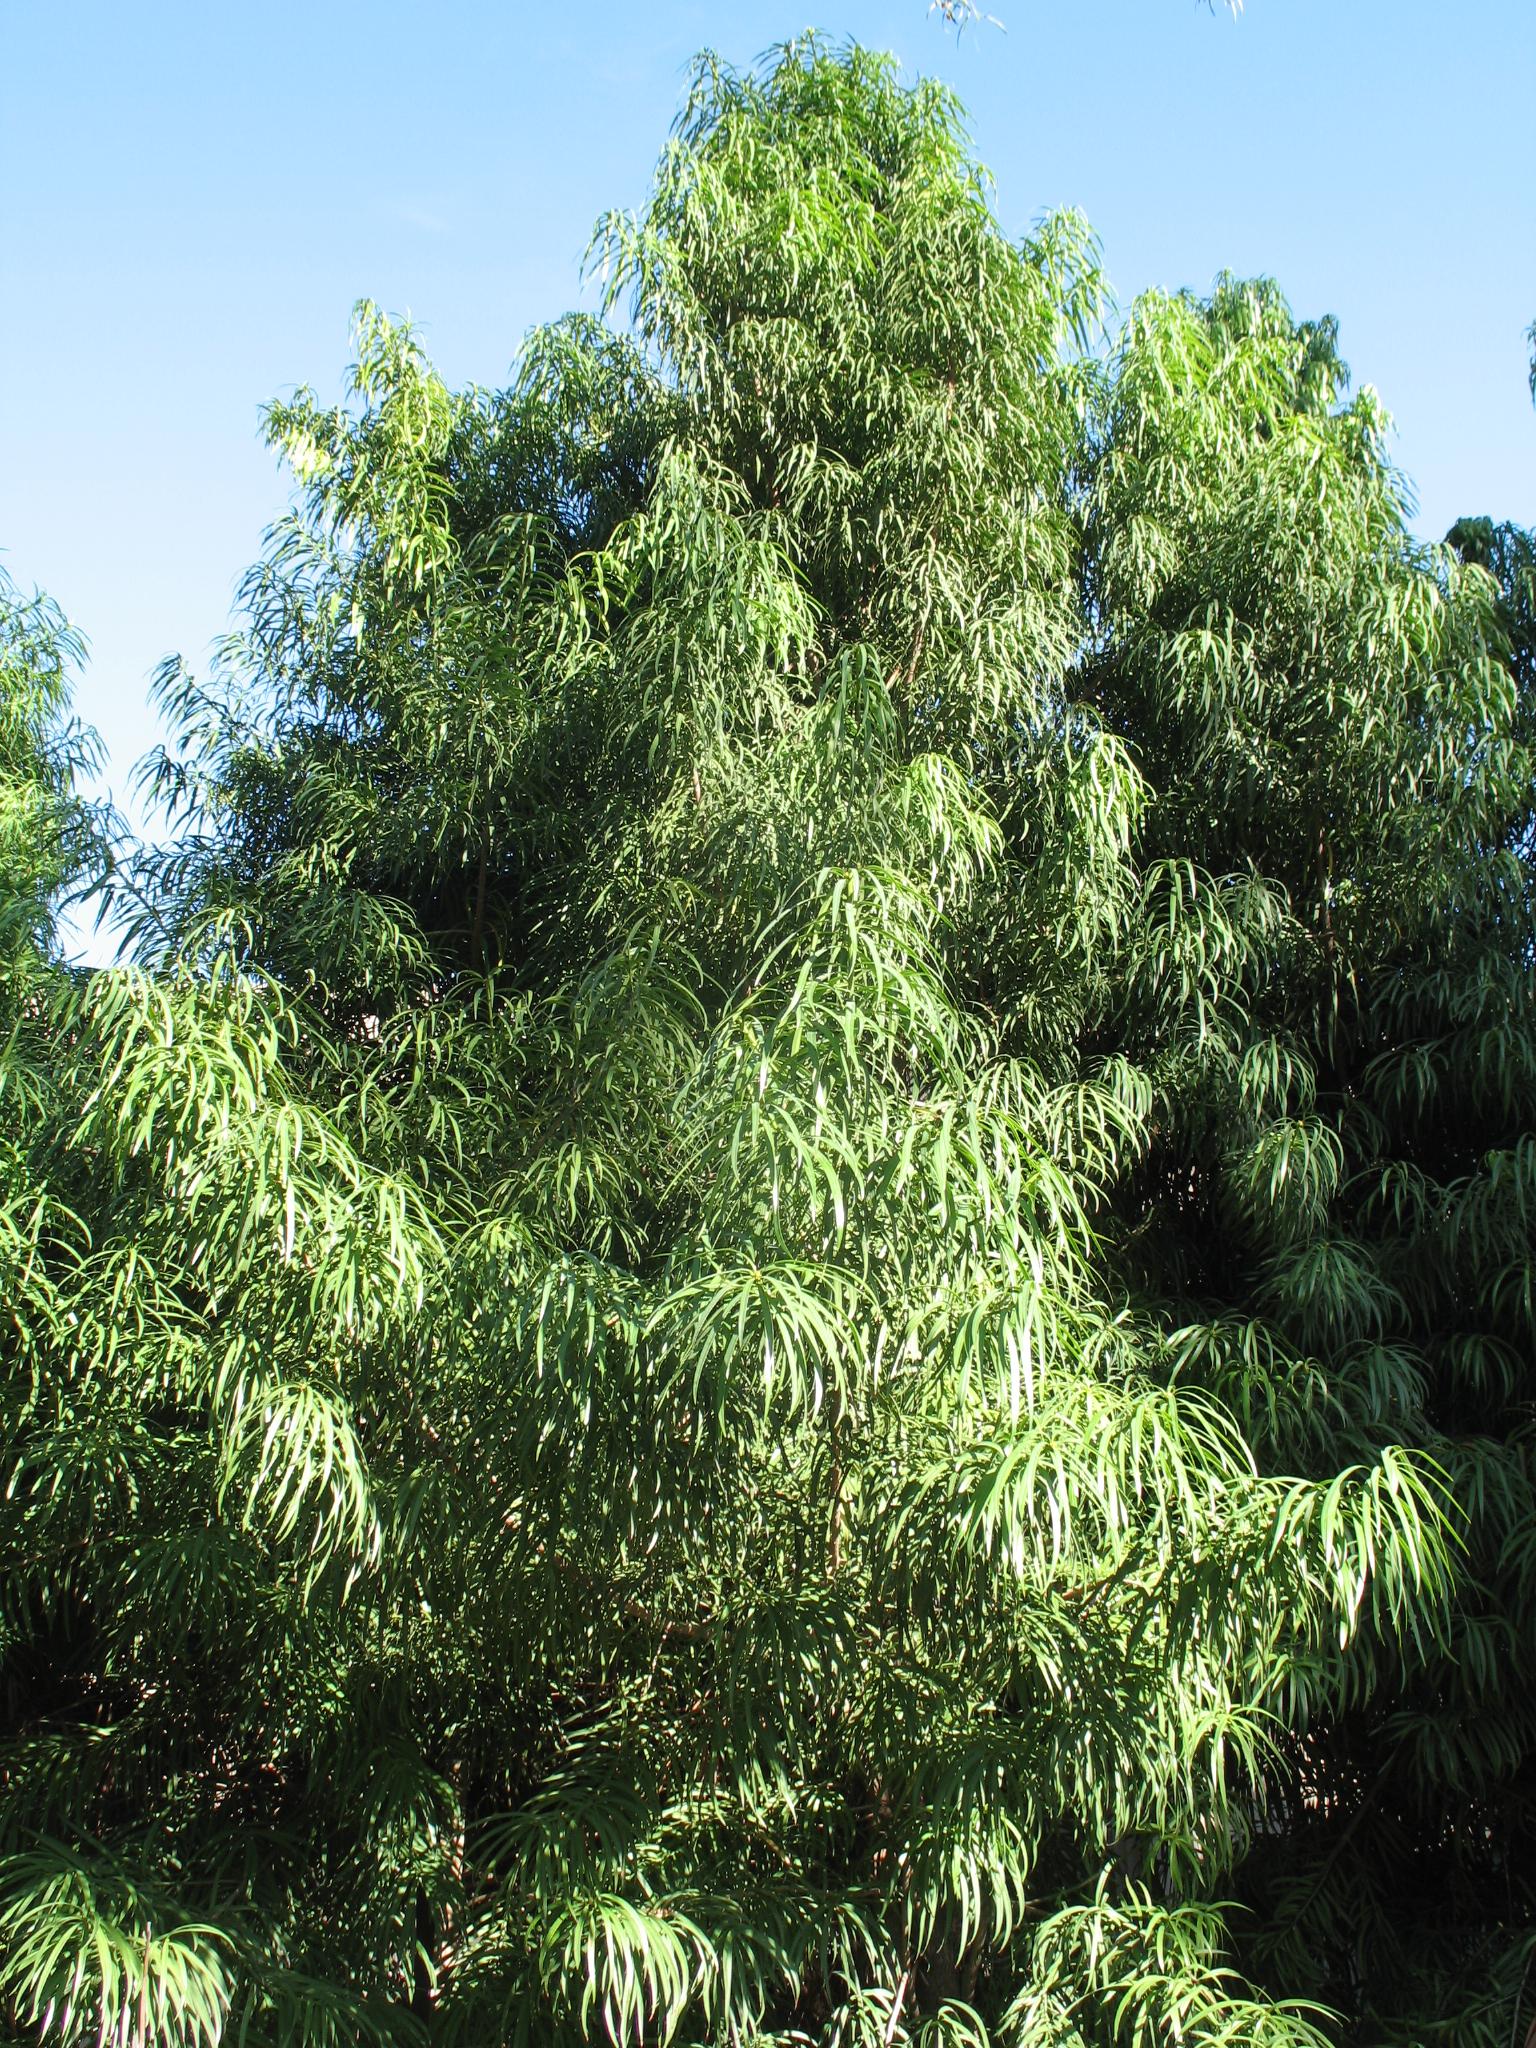 Podocarpus henkelii / Podocarpus henkelii